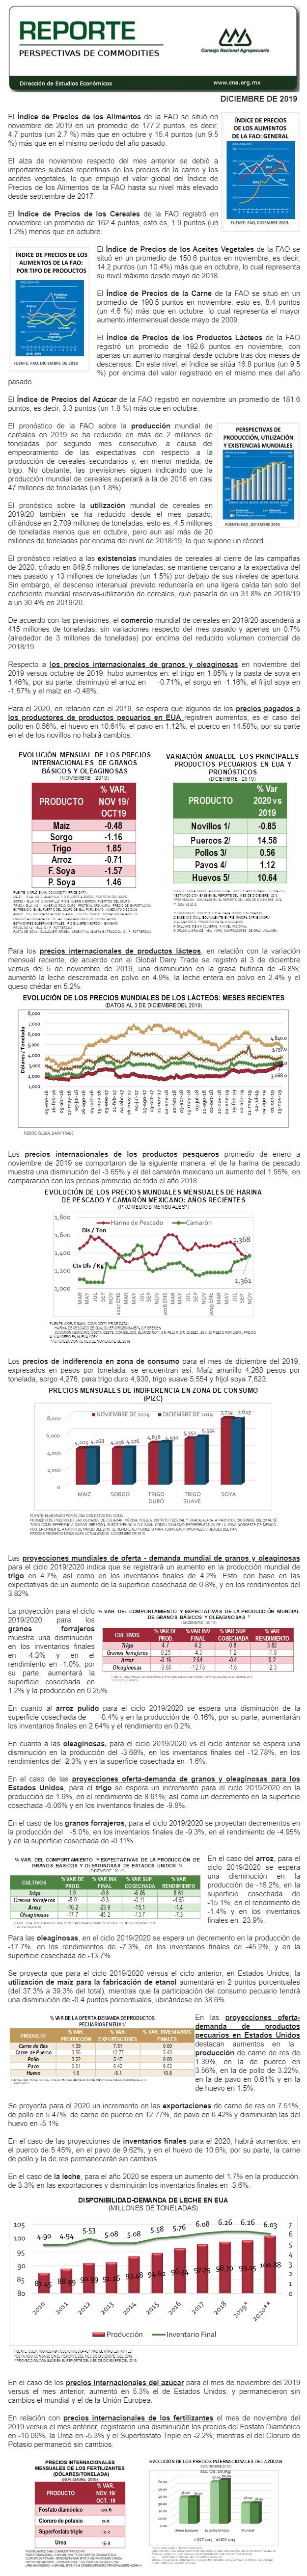 REPORTE DE PERSPECTIVAS DE COMMODITIES DE DICIEMBRE DE 2019.